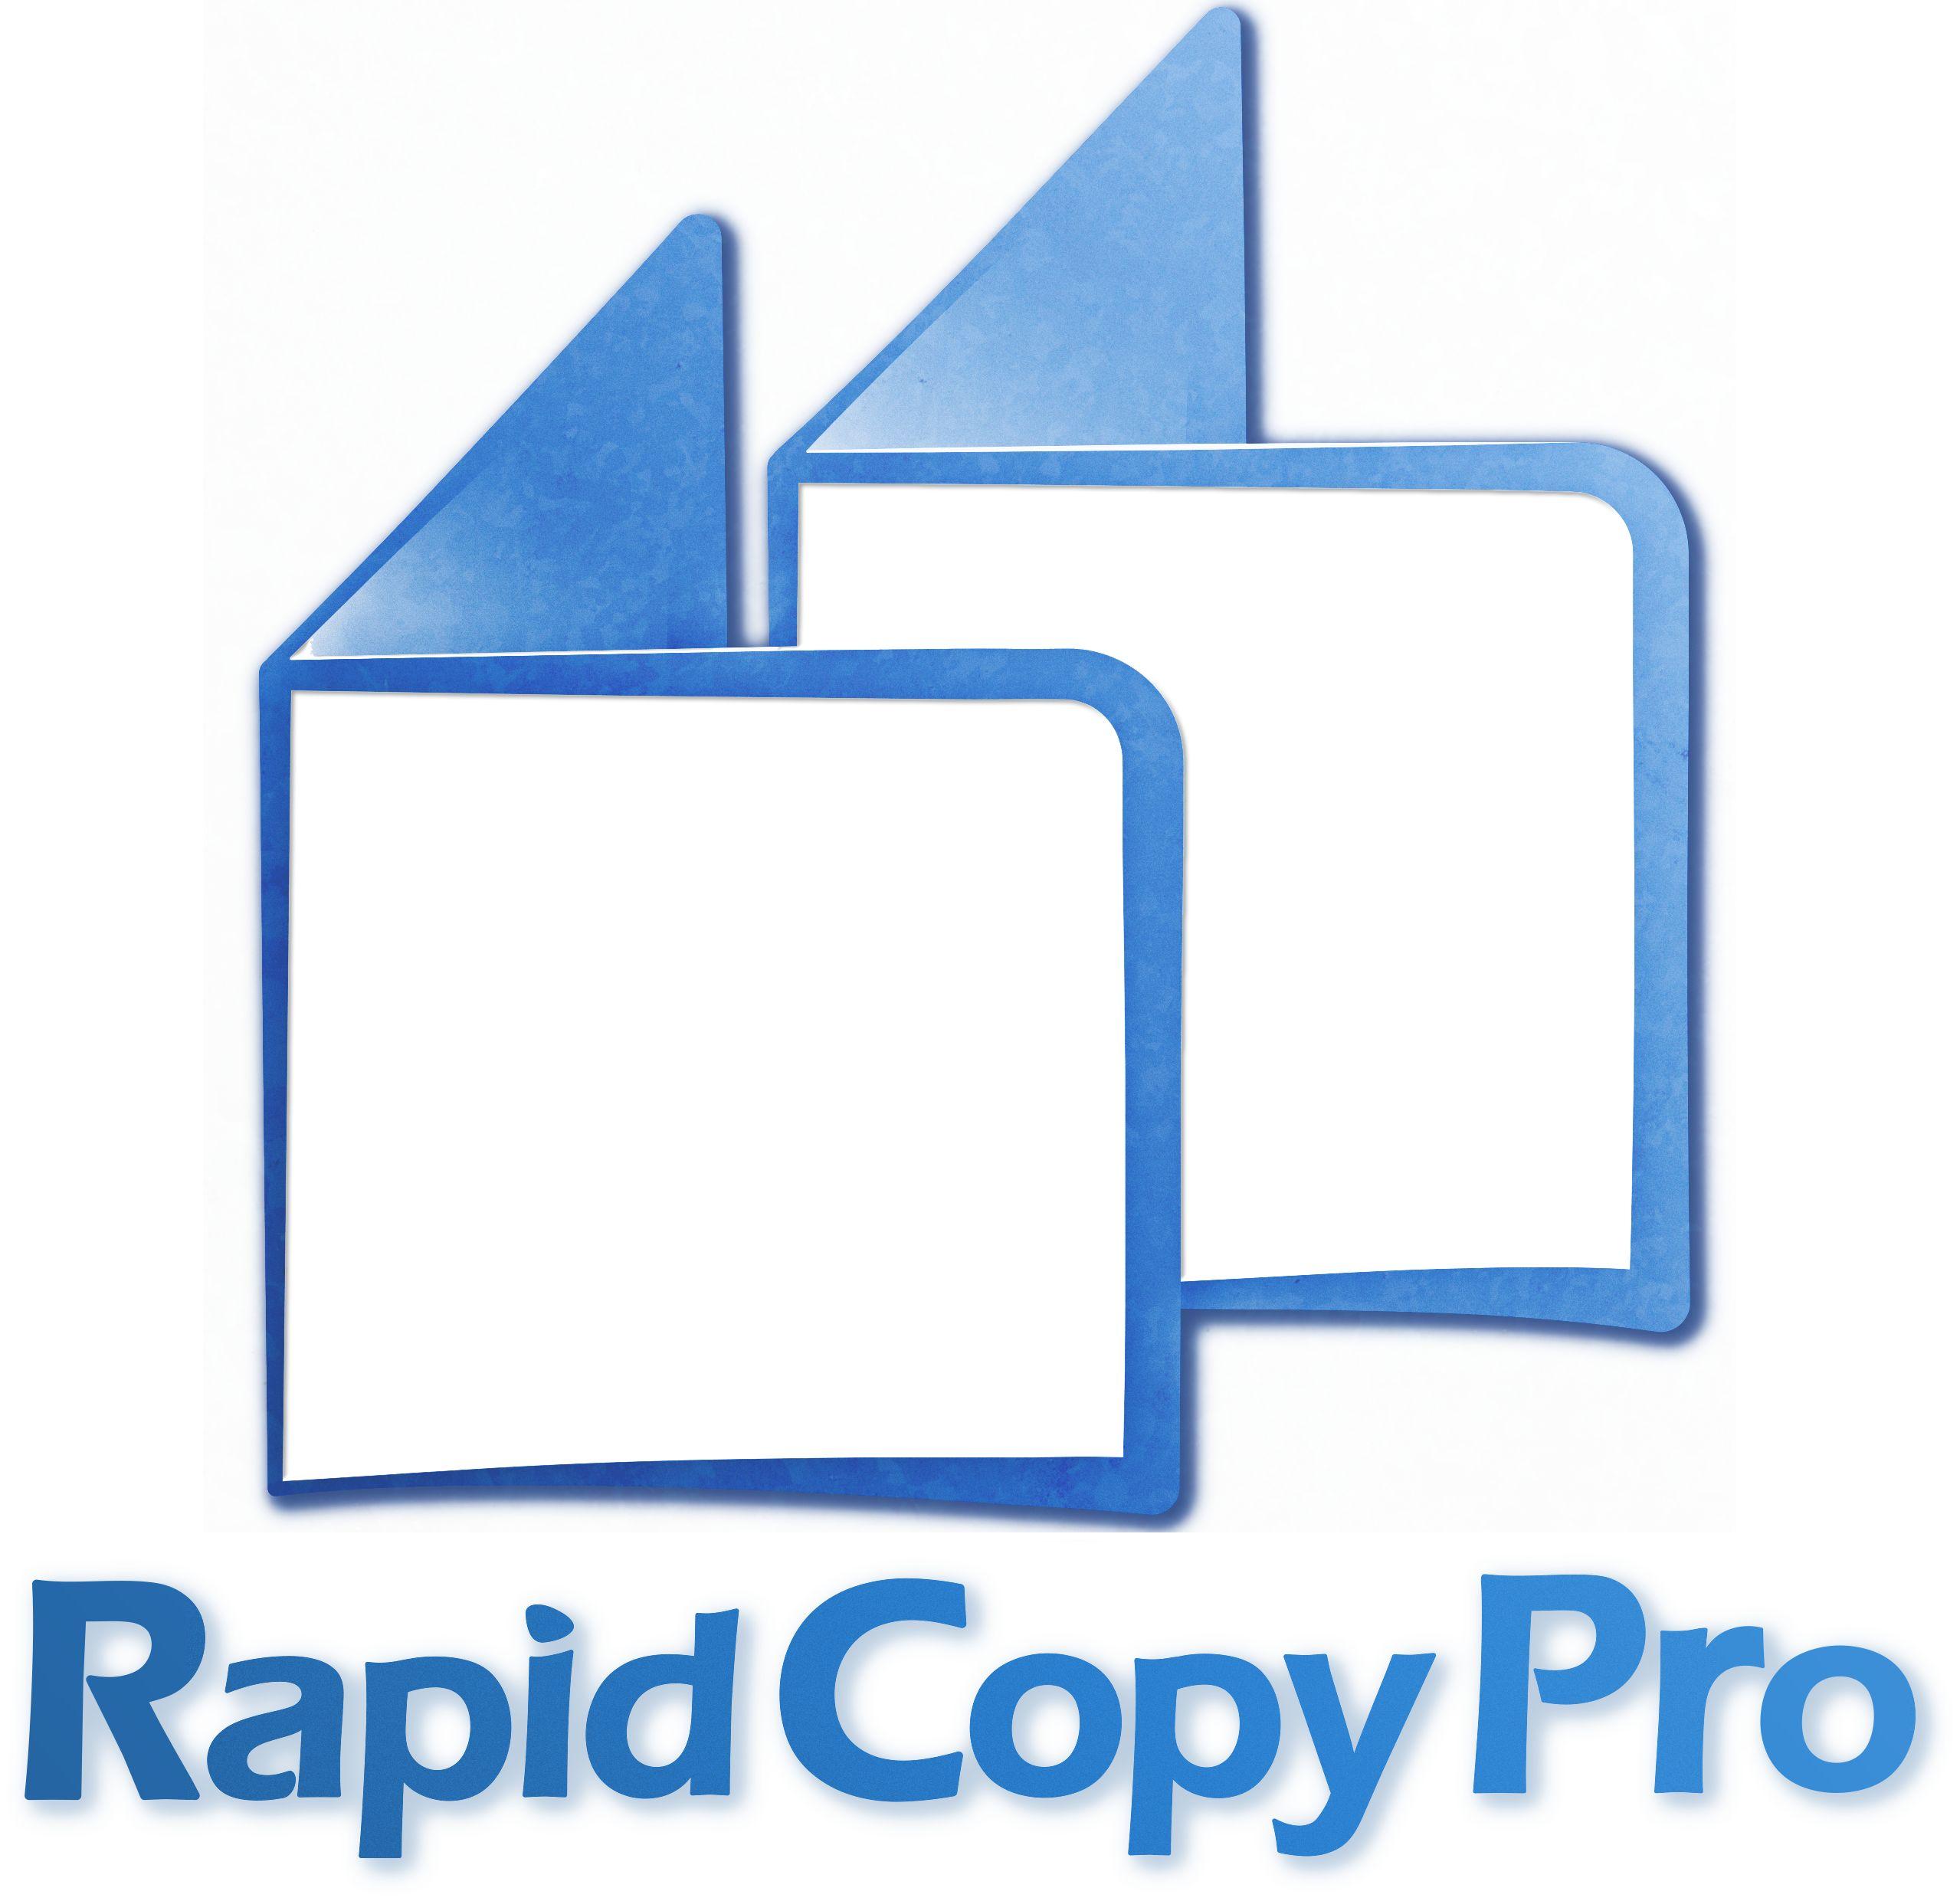 RapidCopy Pro [Download]